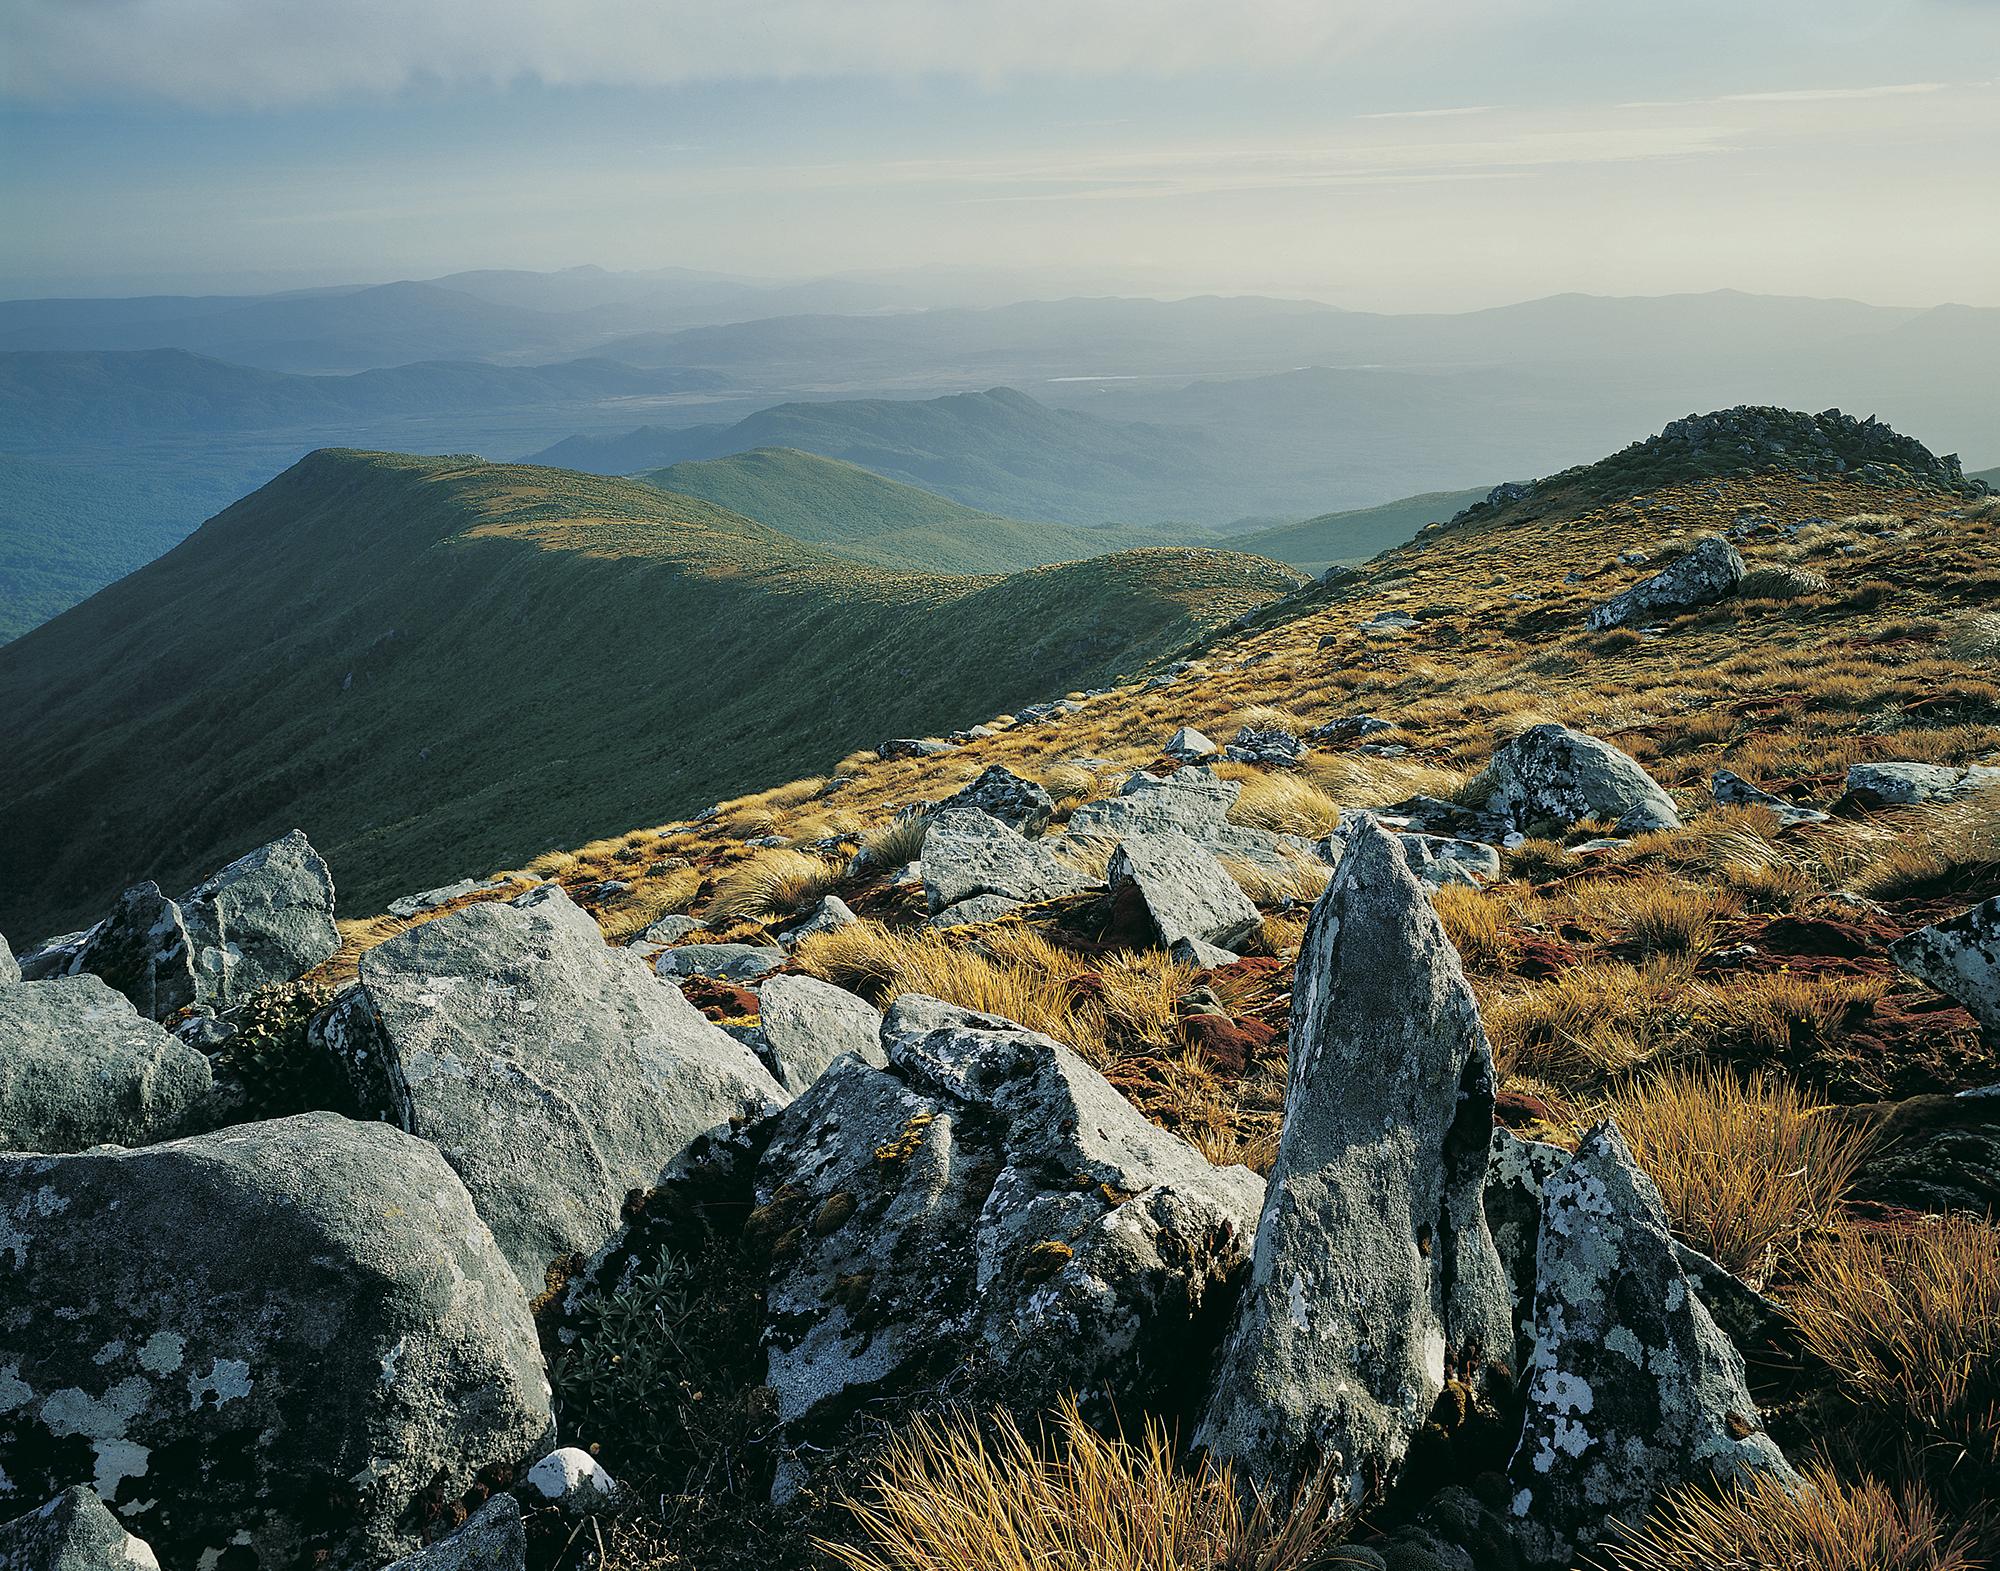 Mount Anglem